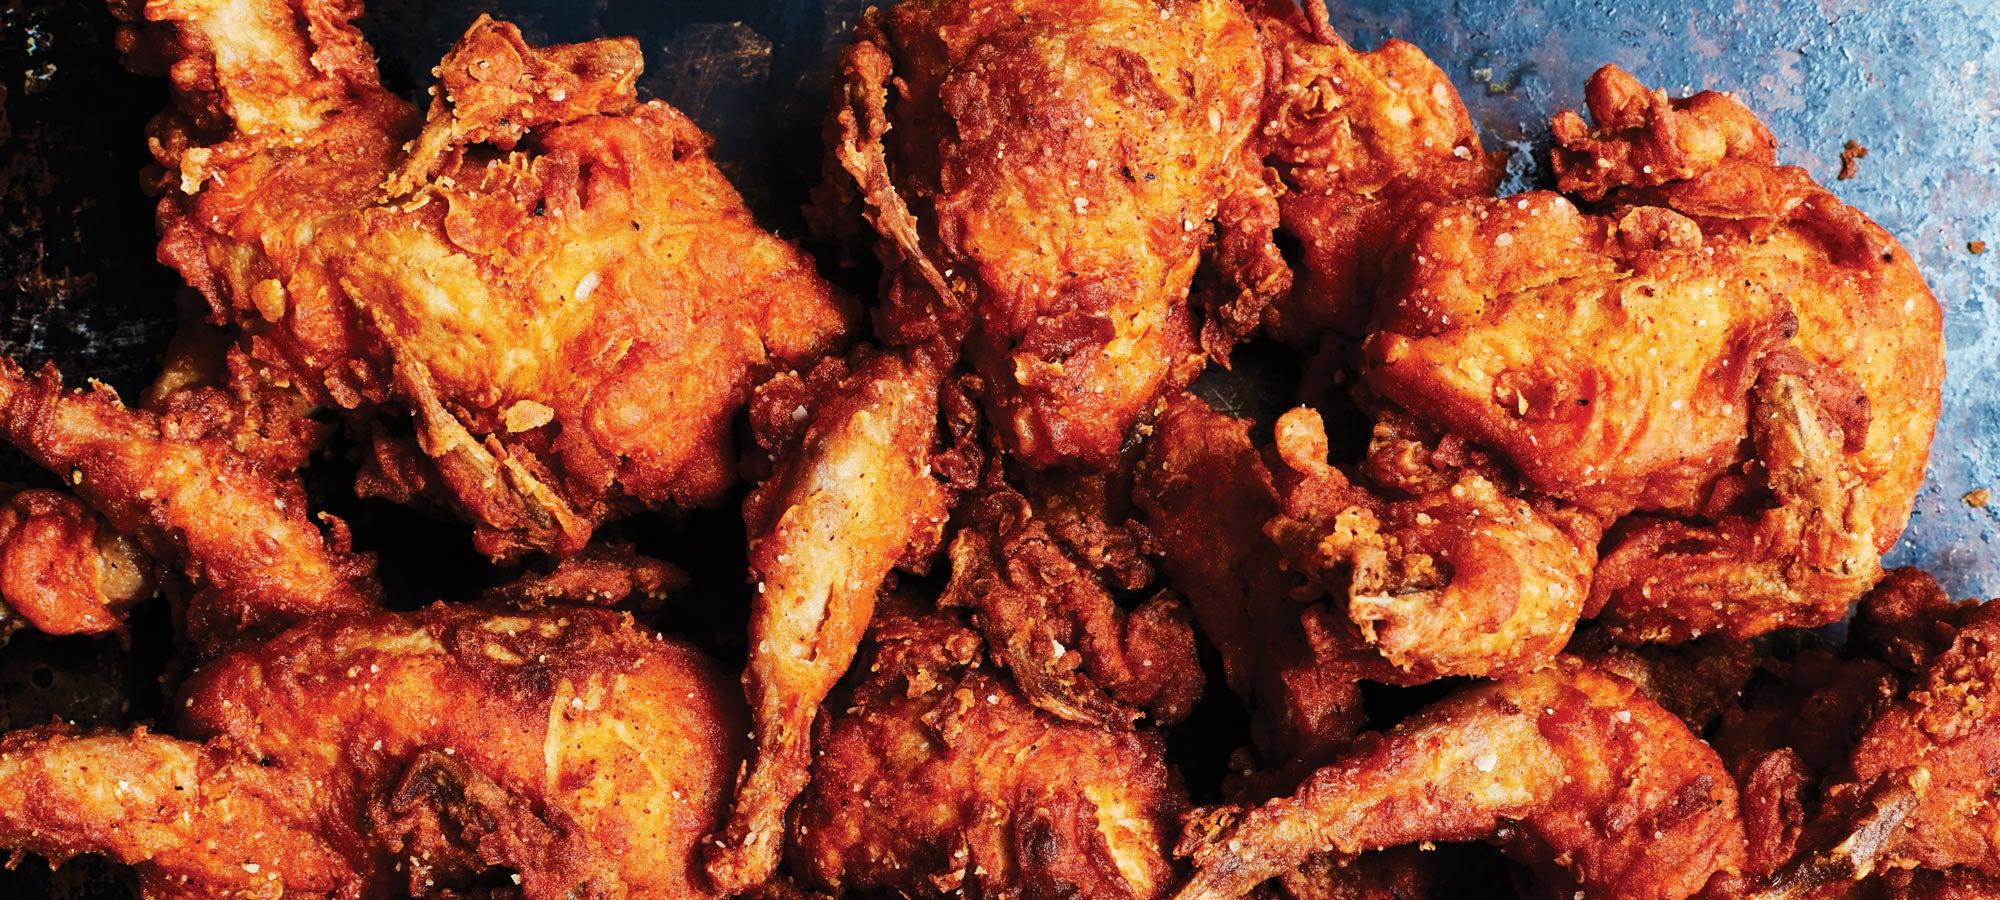 summer fried food recipes